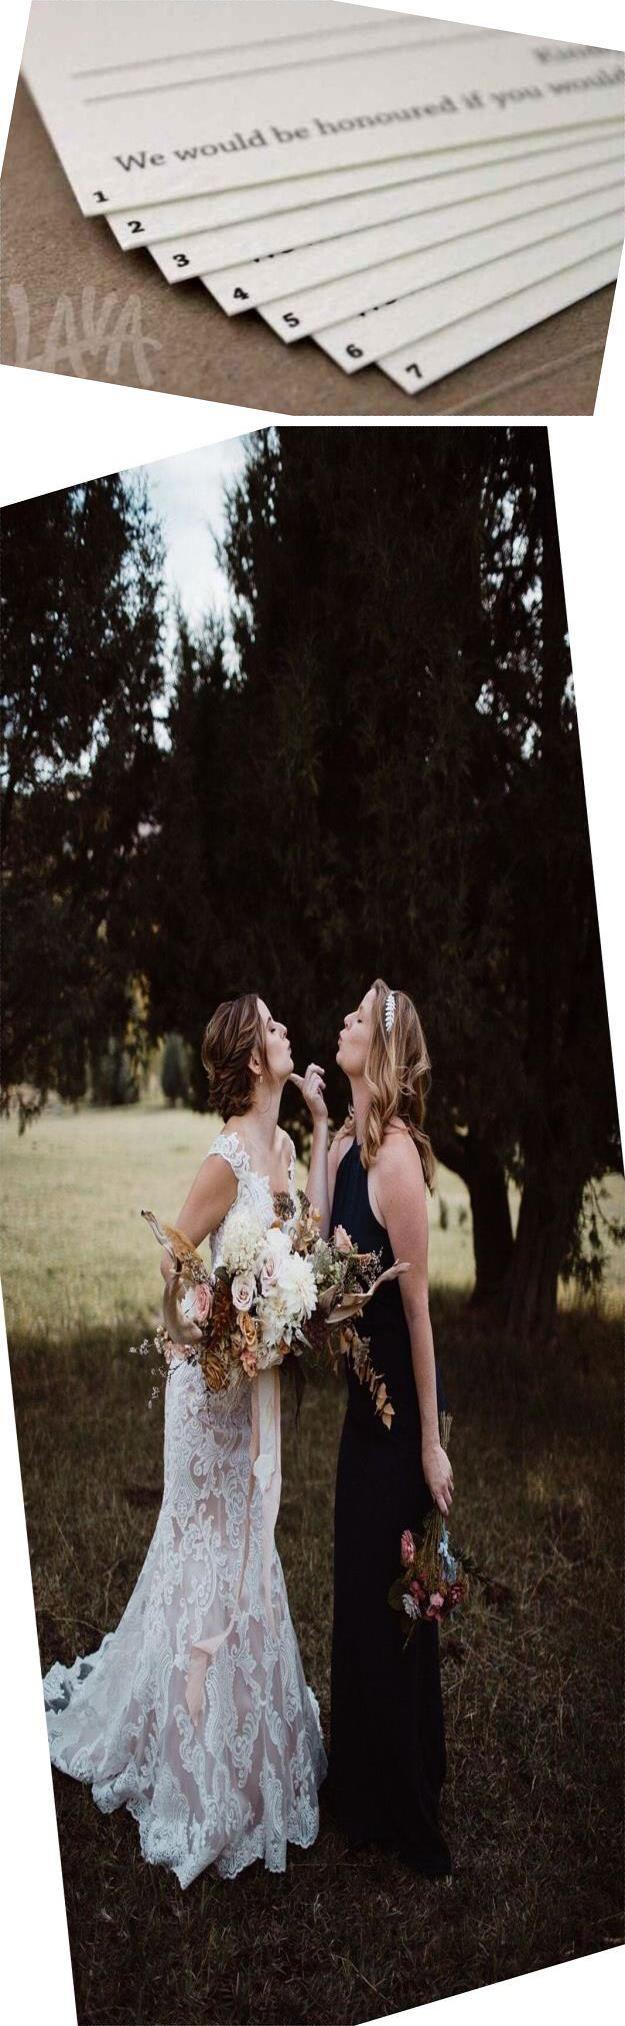 Wedding Decorations Catalogs Wedding Planner Book Free Fun And Unique Wedding Ideas Wedding Wedding Tips Wedding Planner Book